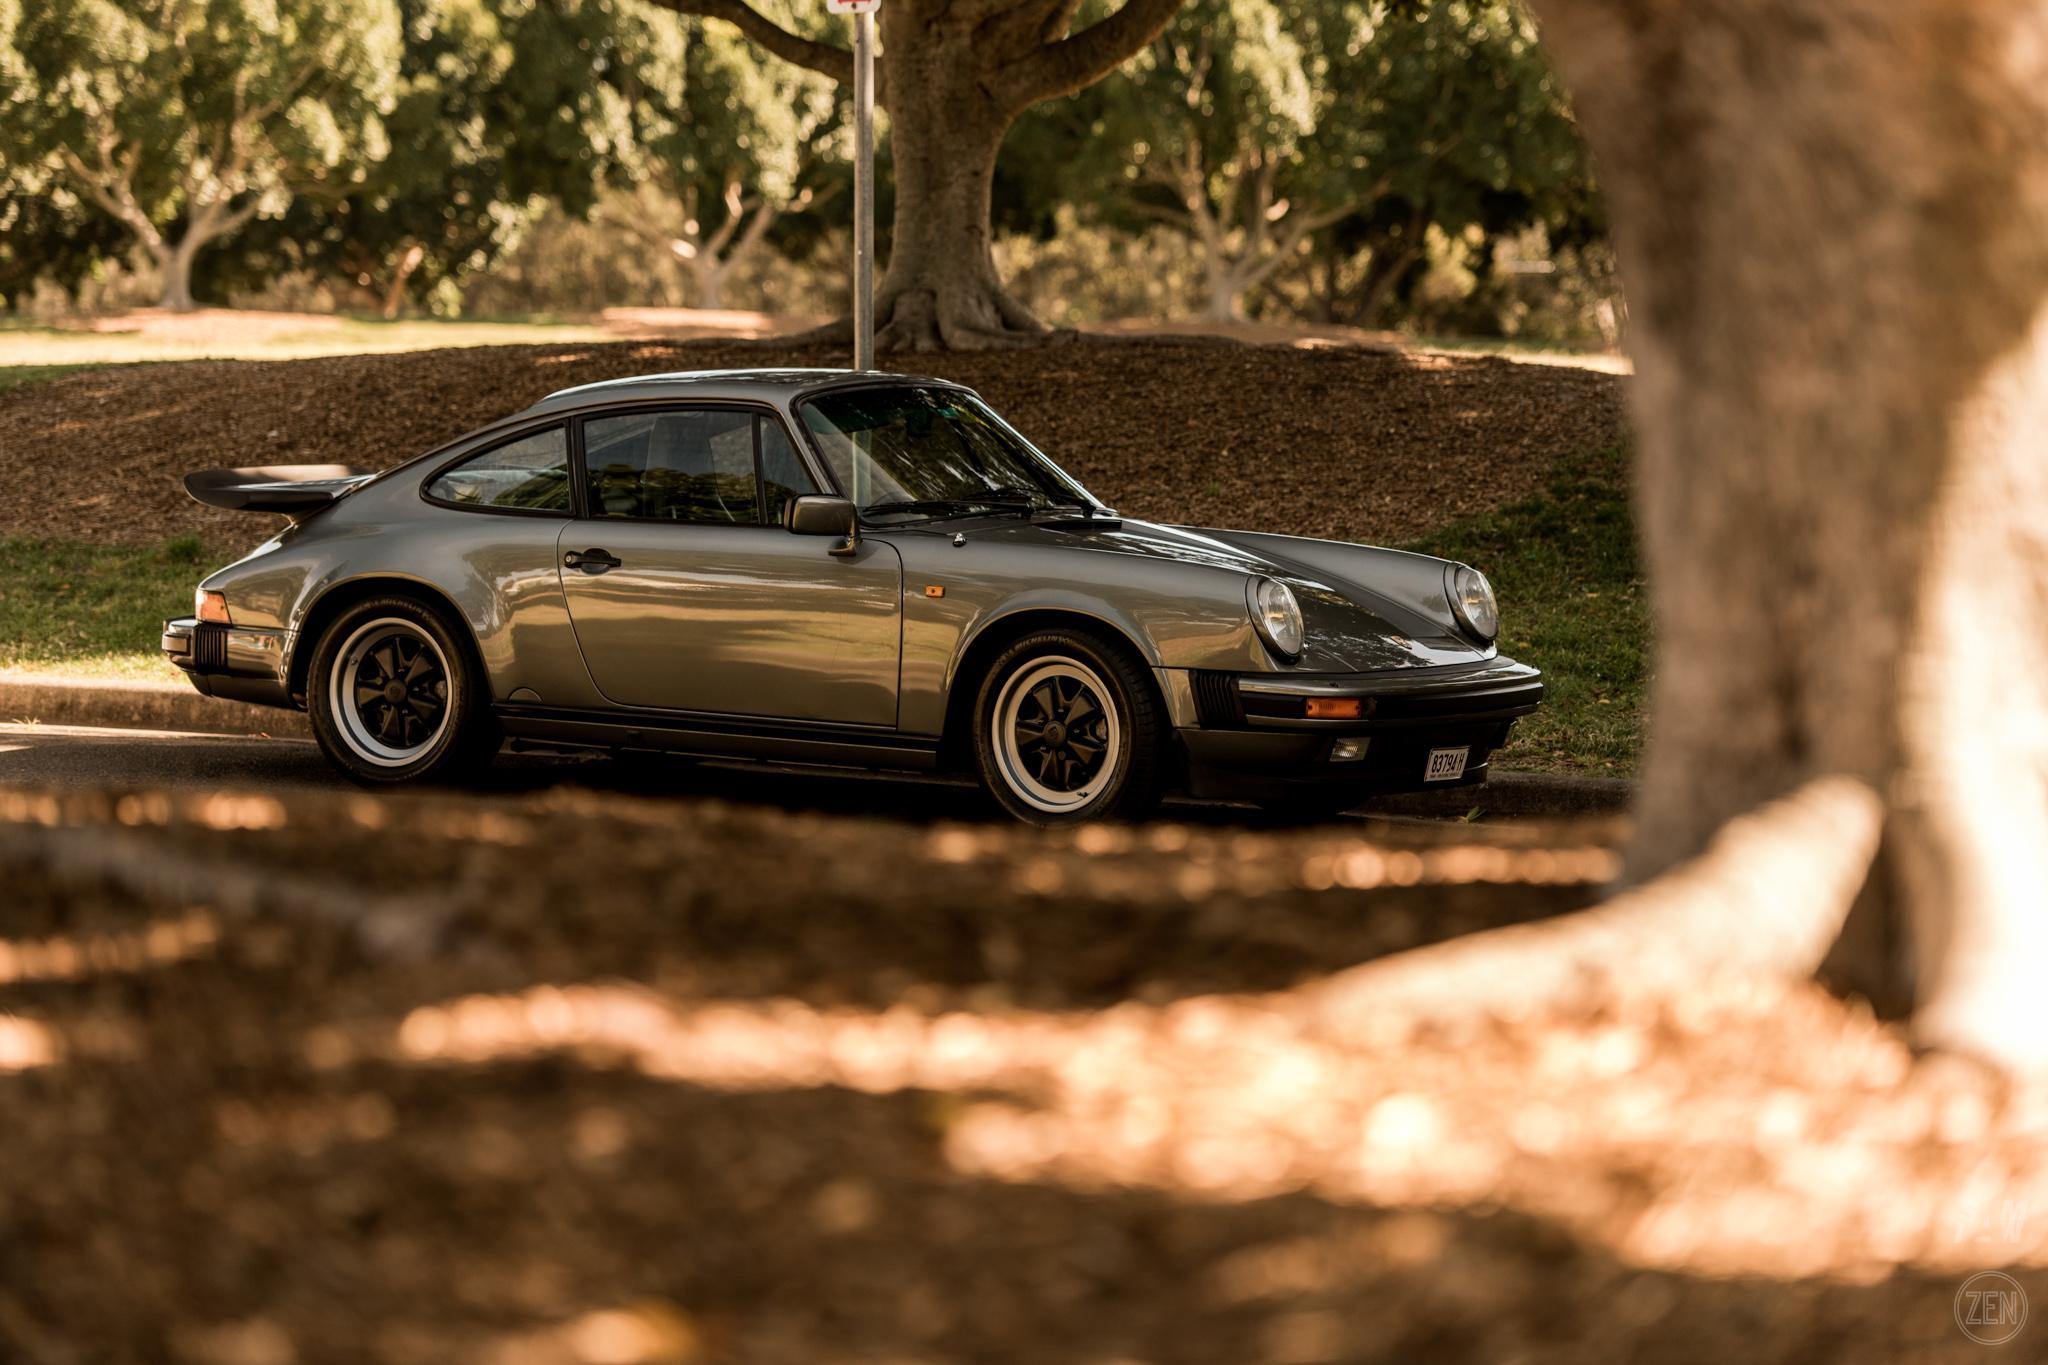 2019-10-27 - Autohaus Porsches & Coffee 176